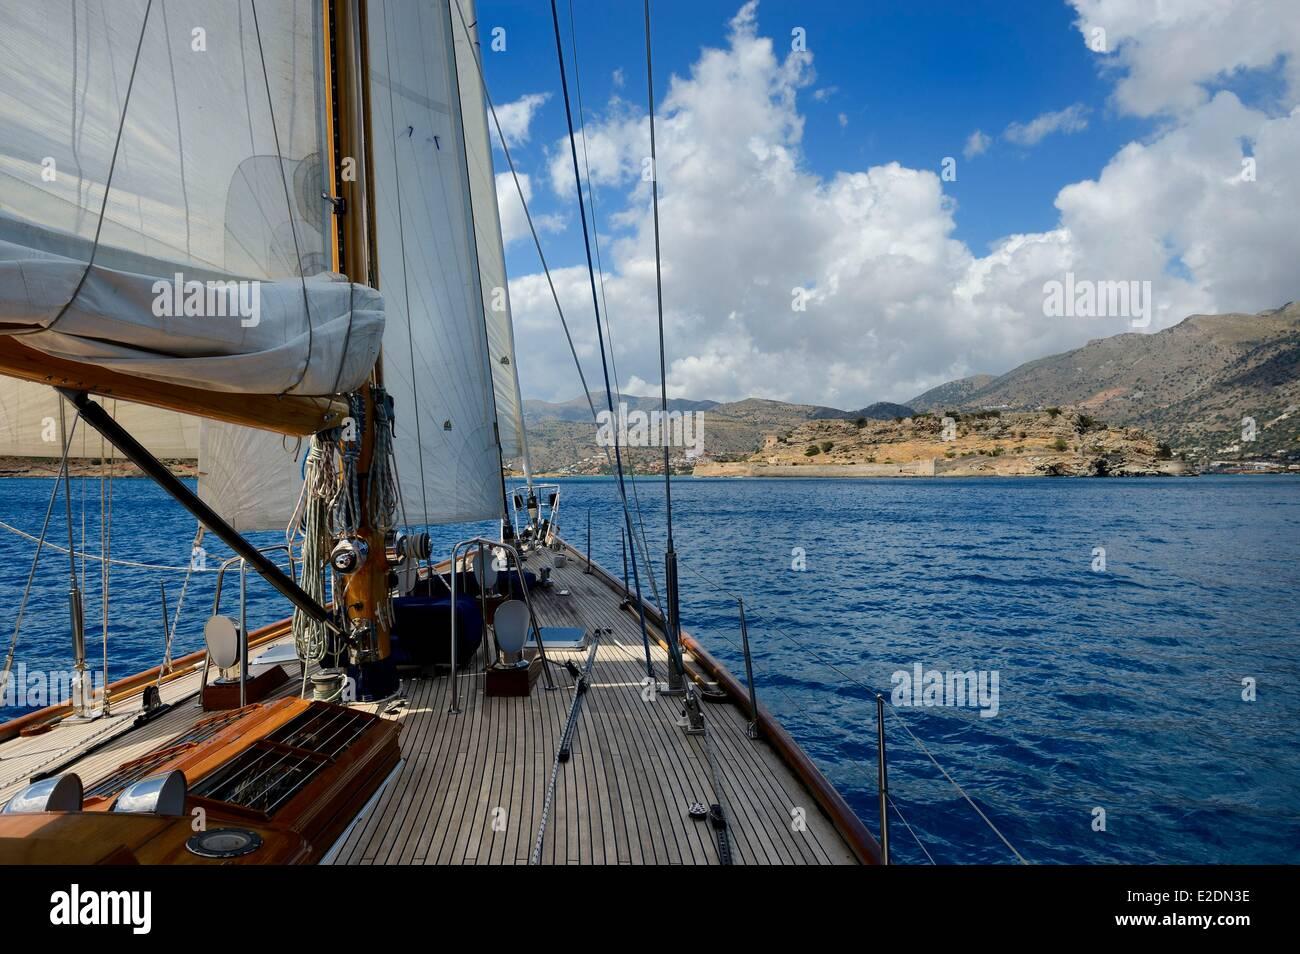 Greece Crete Agios Nikolaos region Elounda 22 meters sailing boat next to island Spinalonga Fort (Kalydon) Venetian - Stock Image